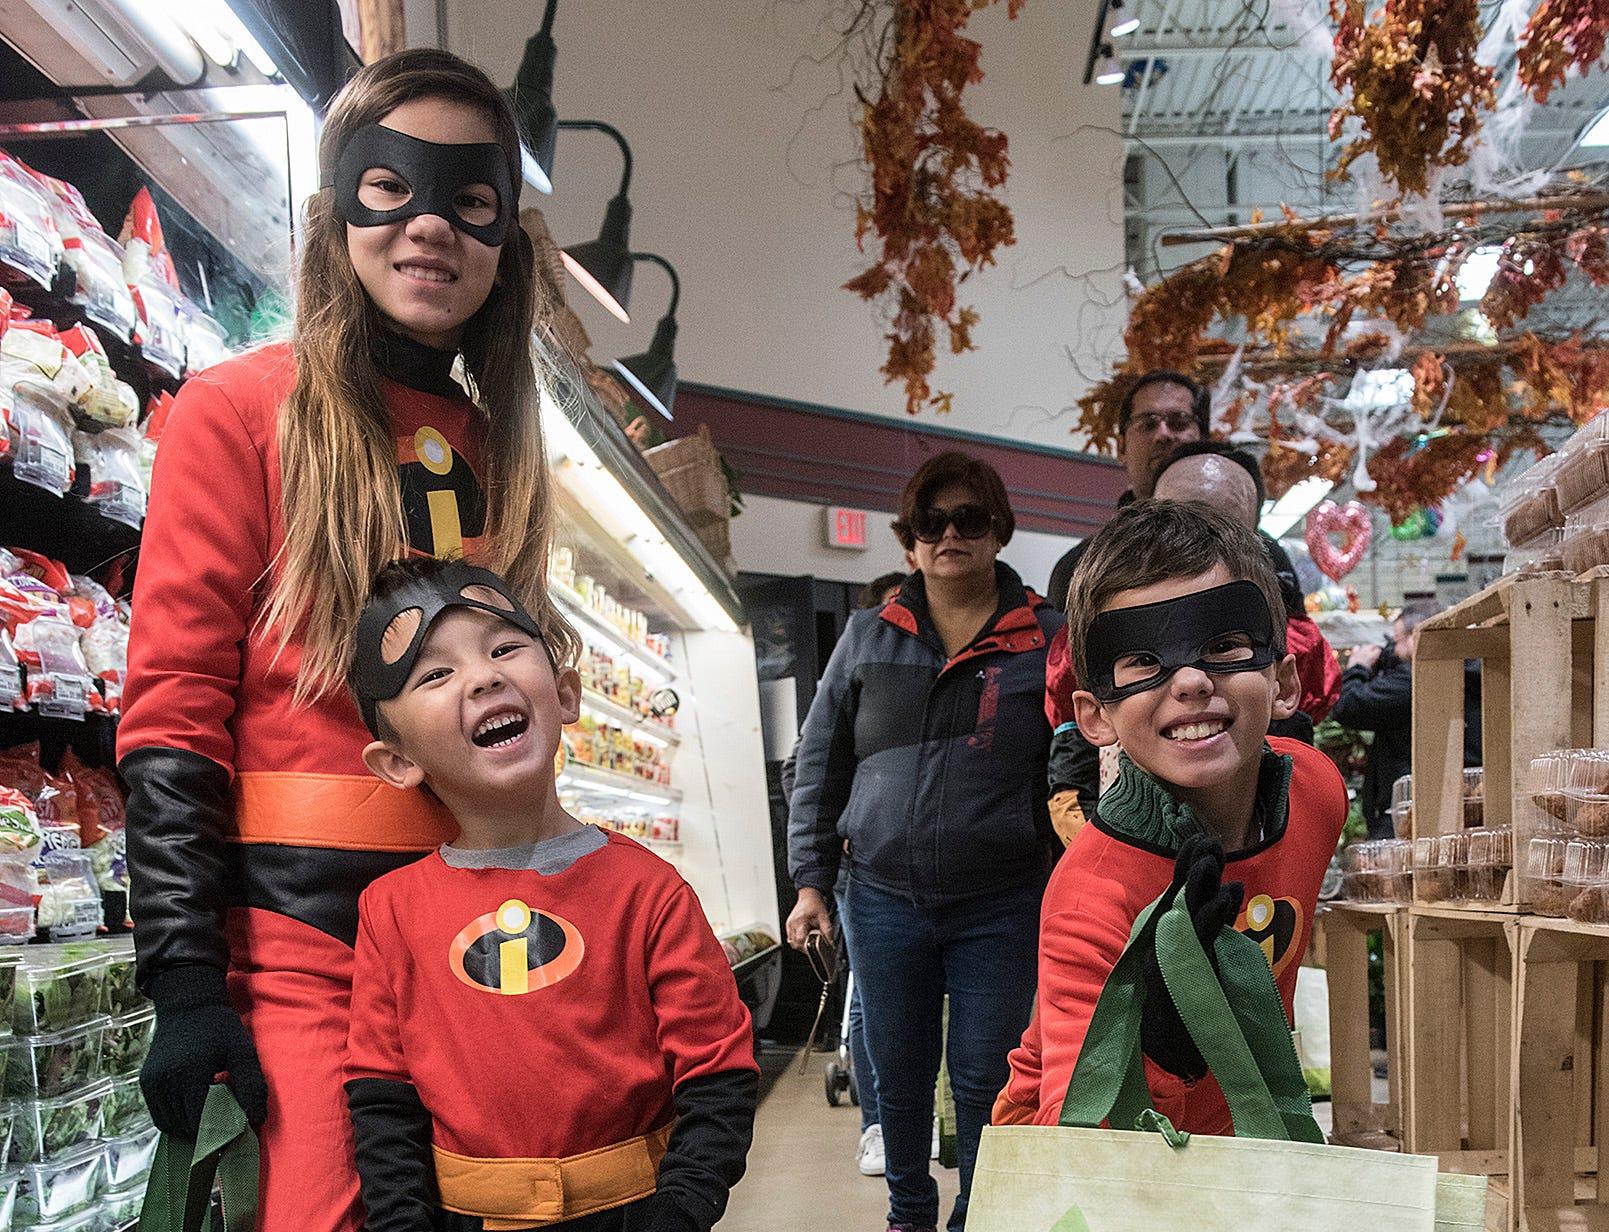 No tricks, just treats as Canton's Holiday Market hosts Halloween bash